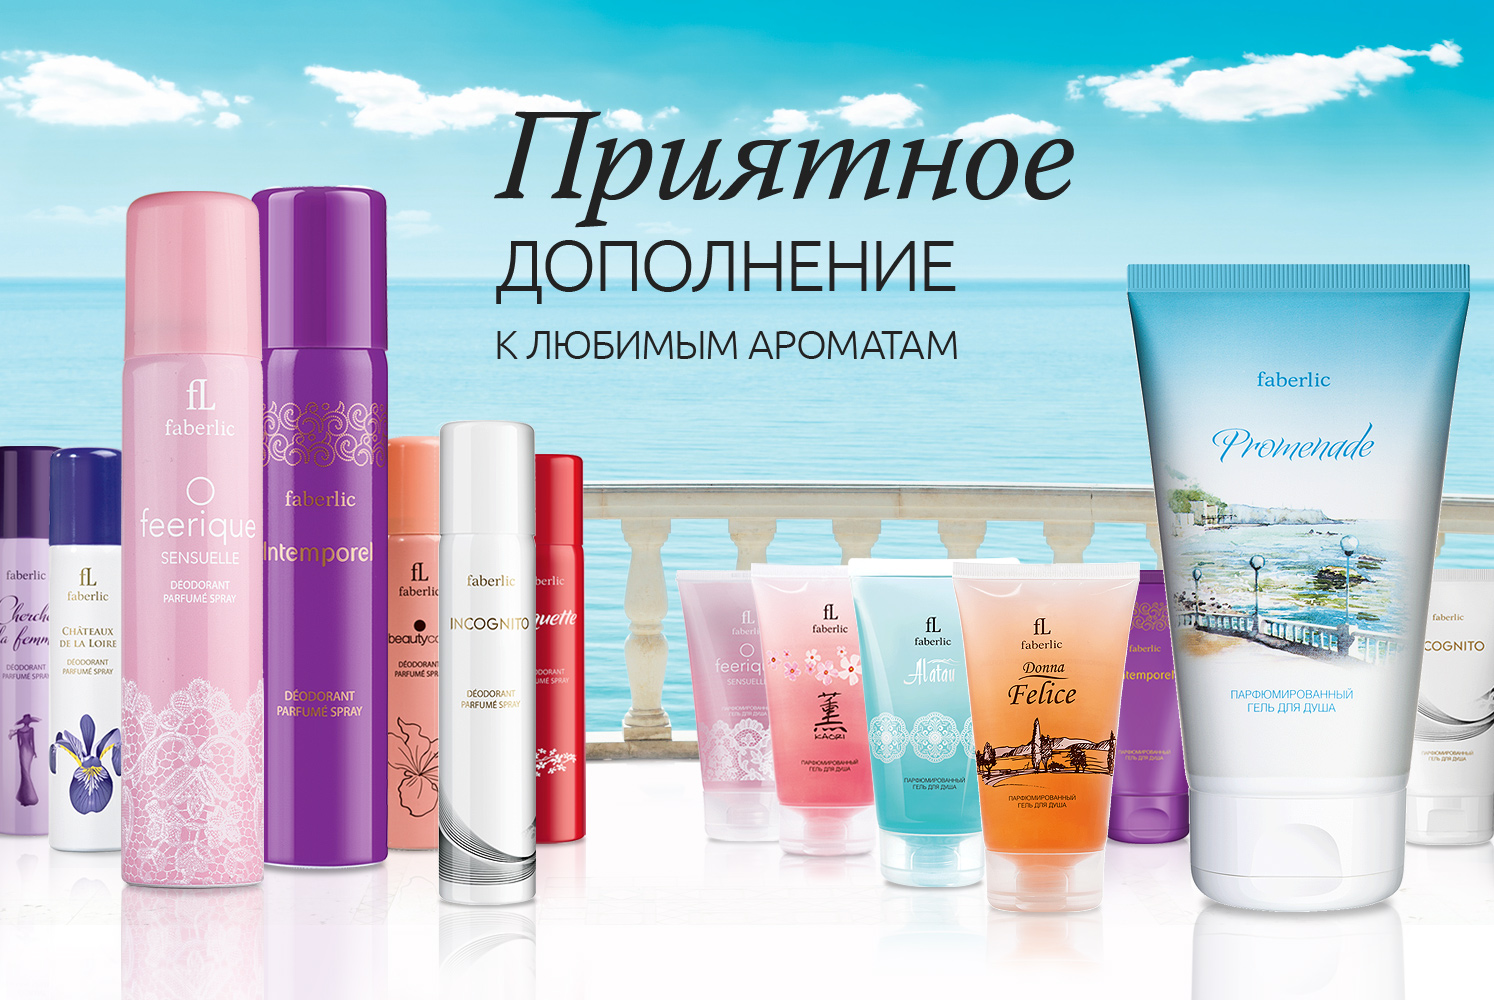 3-parfum-3-2016-action